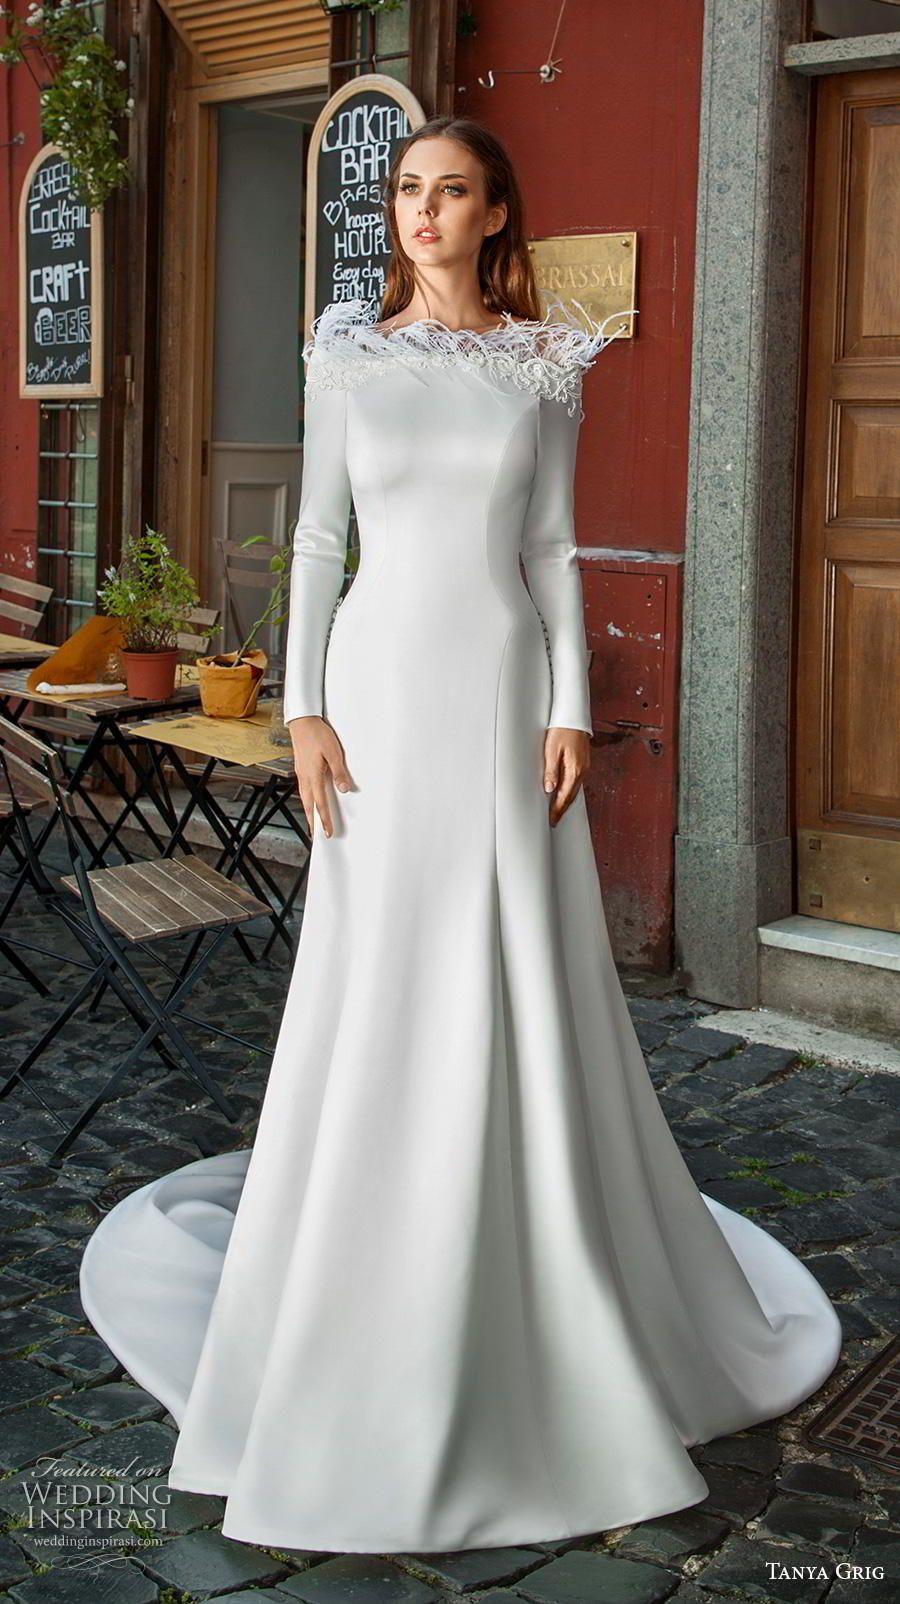 Tanya Grig 2019 Wedding Dresses Roman Holiday Bridal Collection Wedding Inspirasi Bridal Dresses Lace Minimalist Wedding Dresses Wedding Dress Long Sleeve [ 1604 x 900 Pixel ]